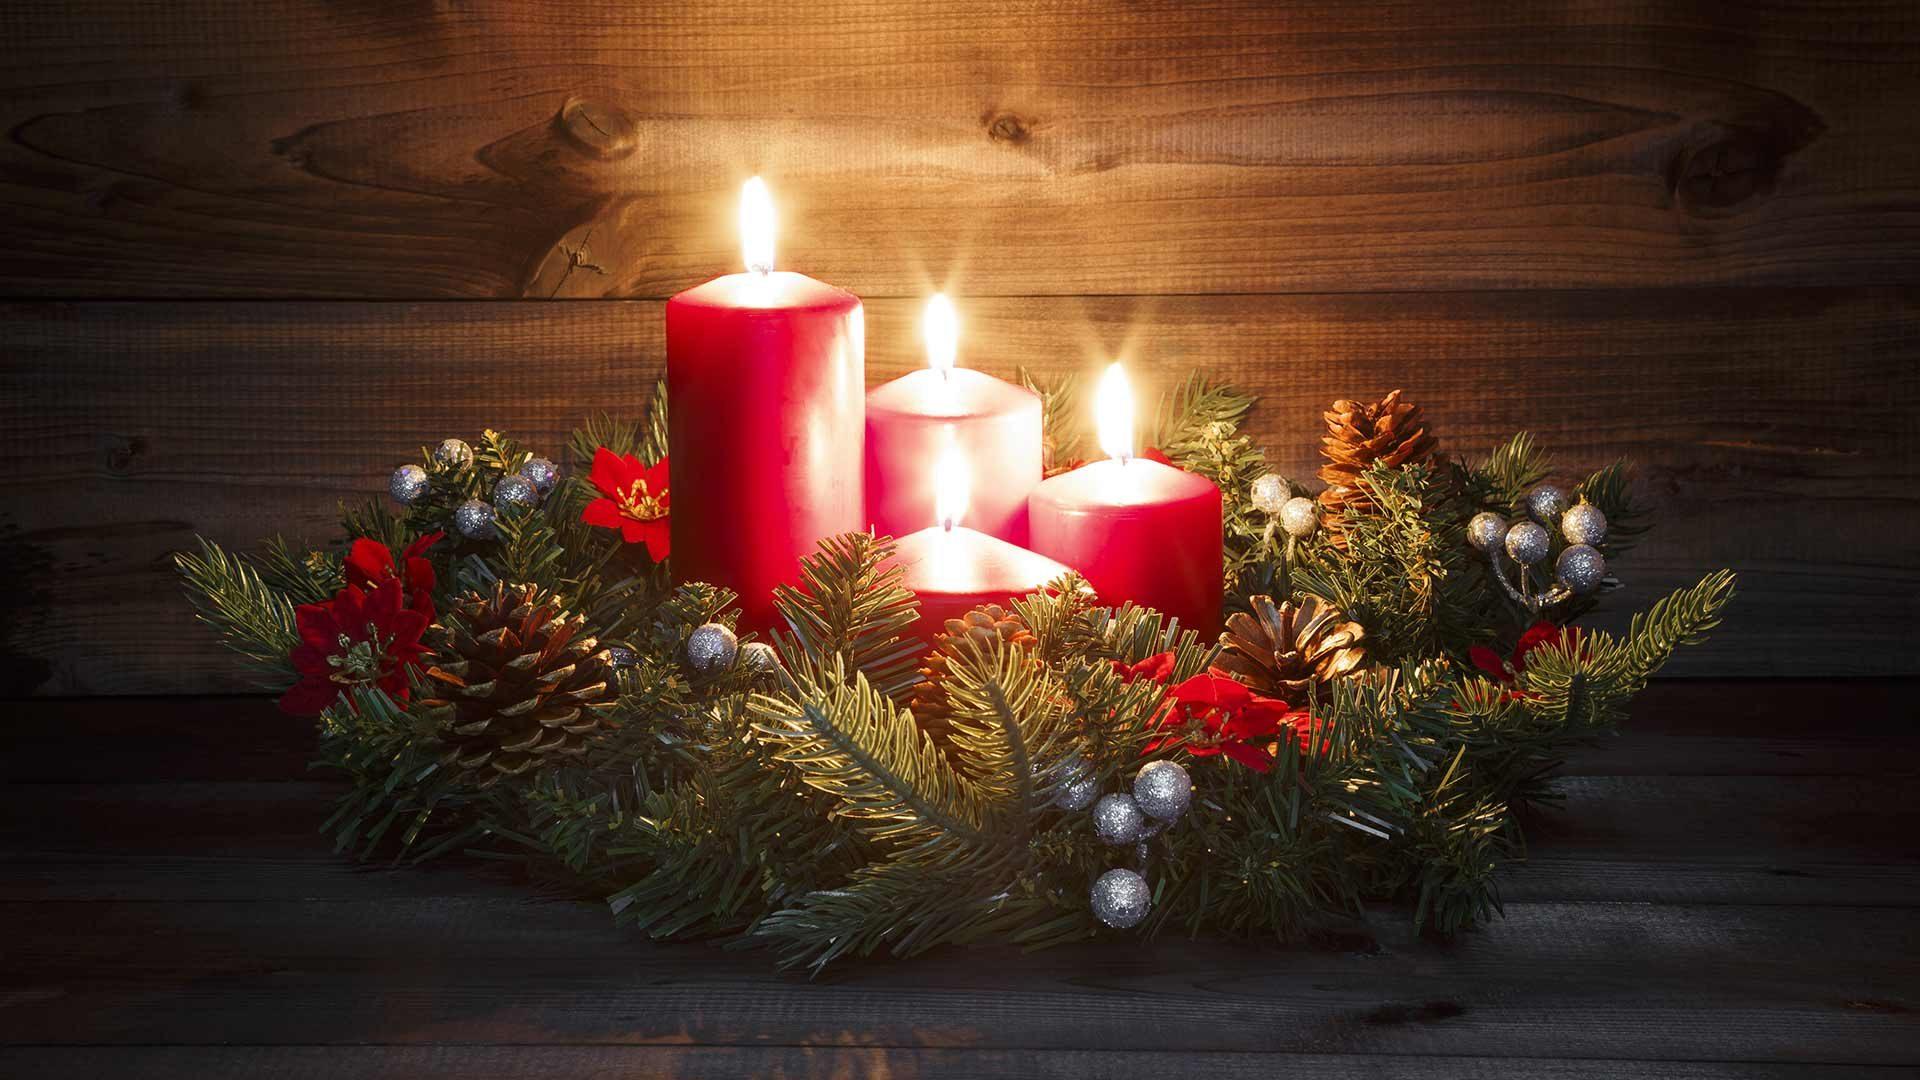 Magia del Natale a Parcines